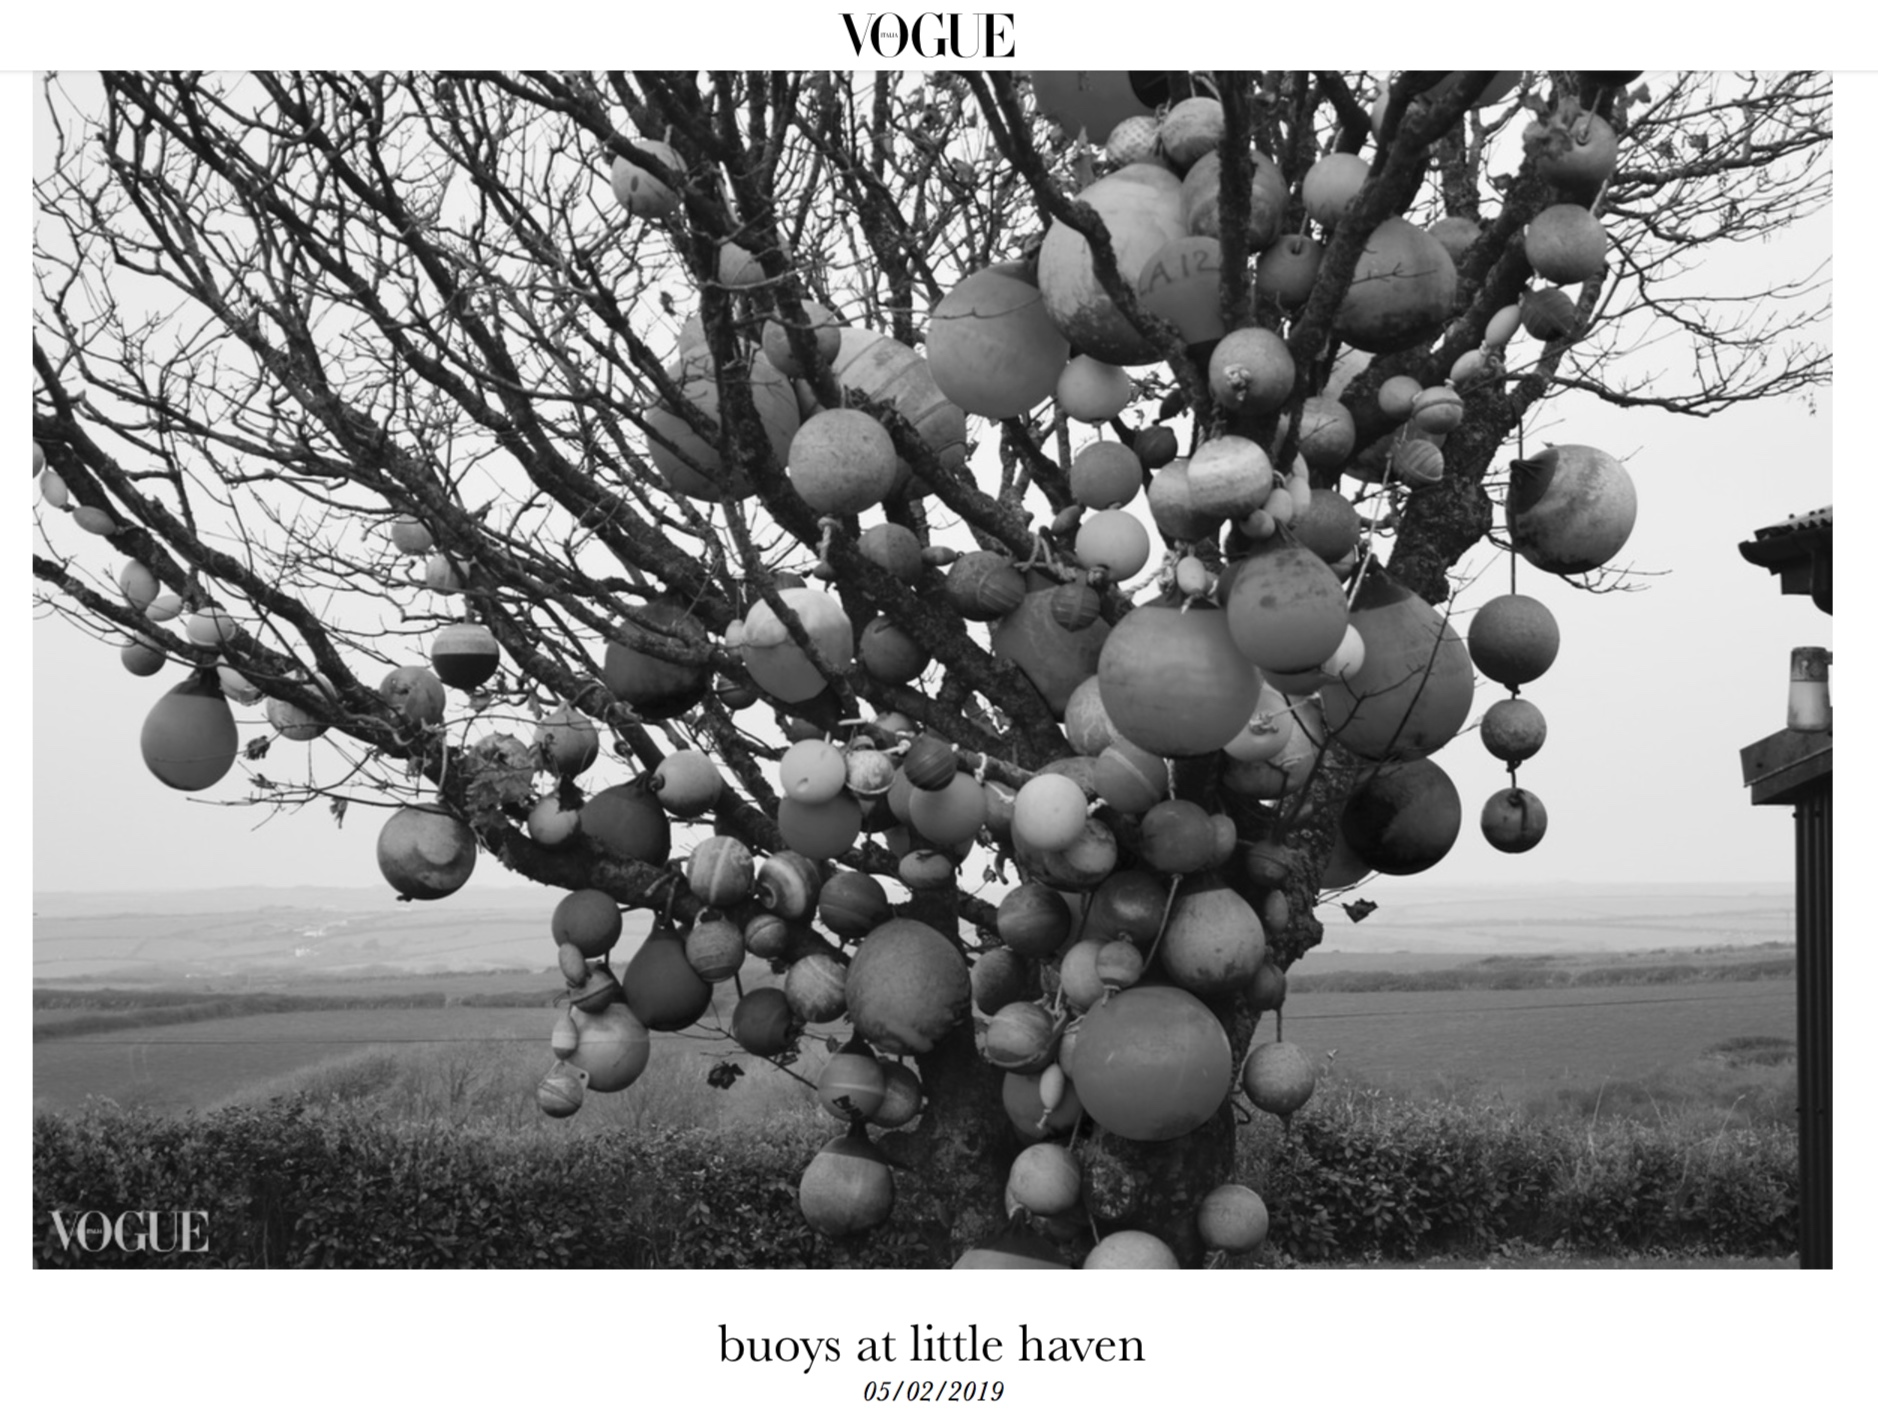 vogue+buoys+at+little+haven.jpg